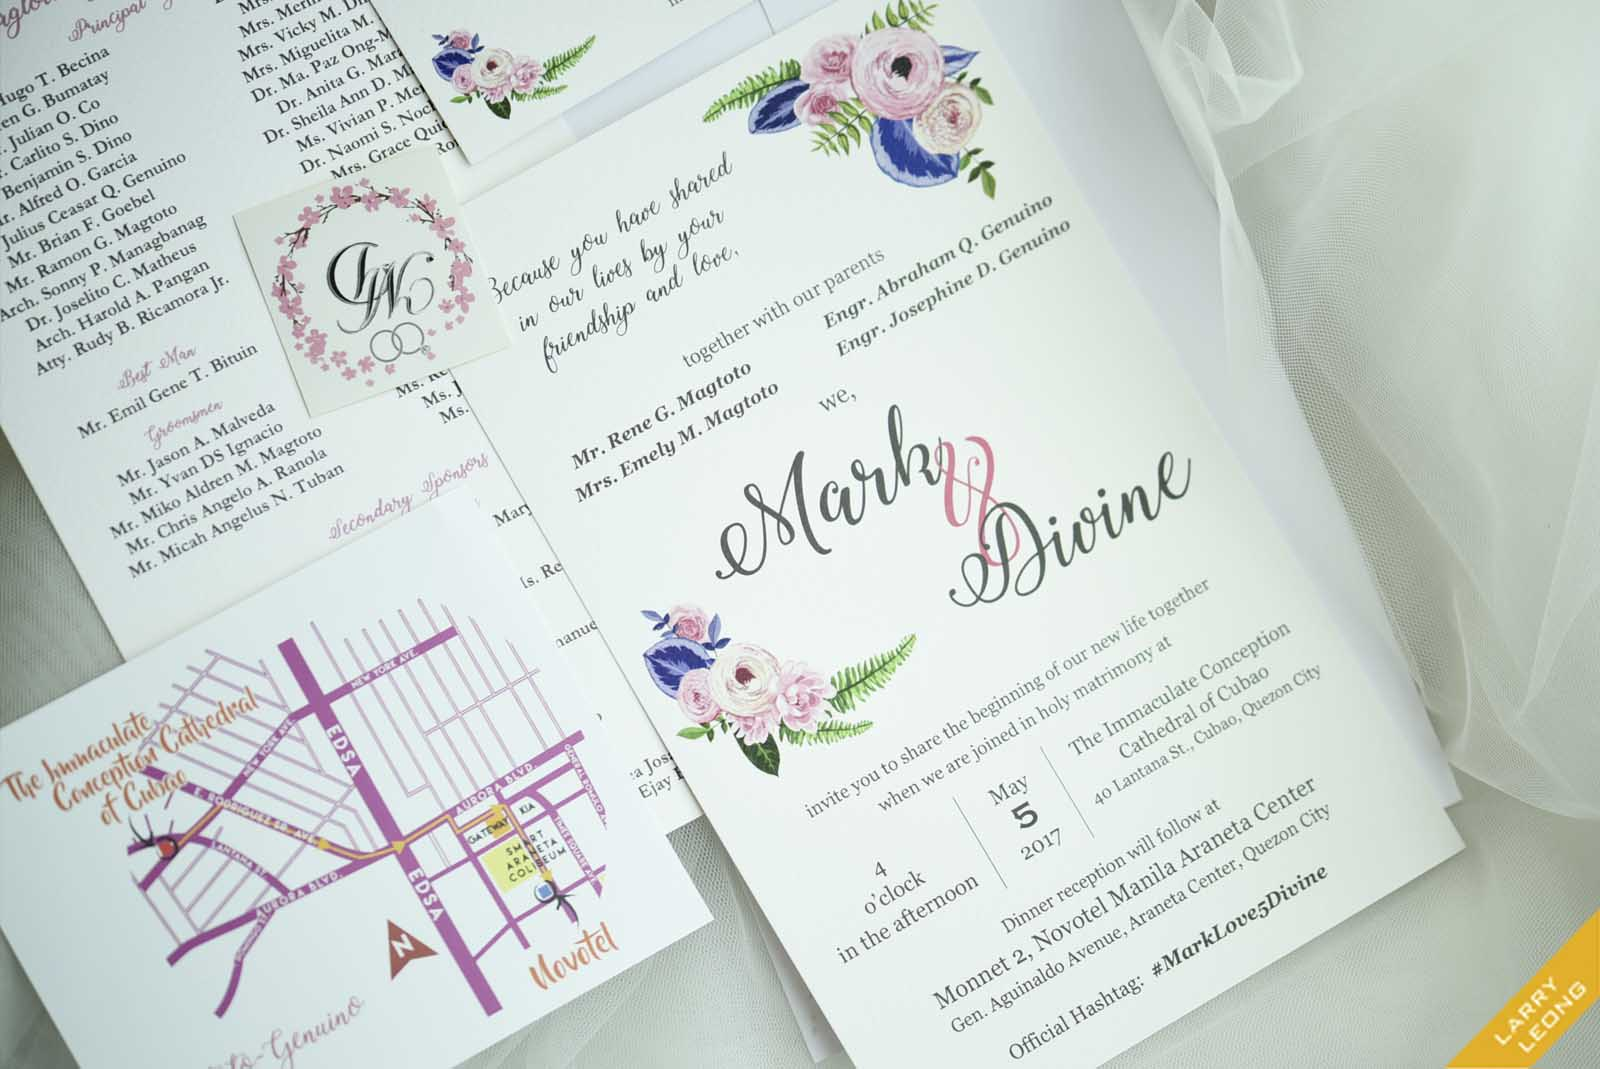 Invitation maker cubao images invitation sample and invitation design mark divines novotel wedding larry leong cubao invitation stopboris images stopboris Gallery